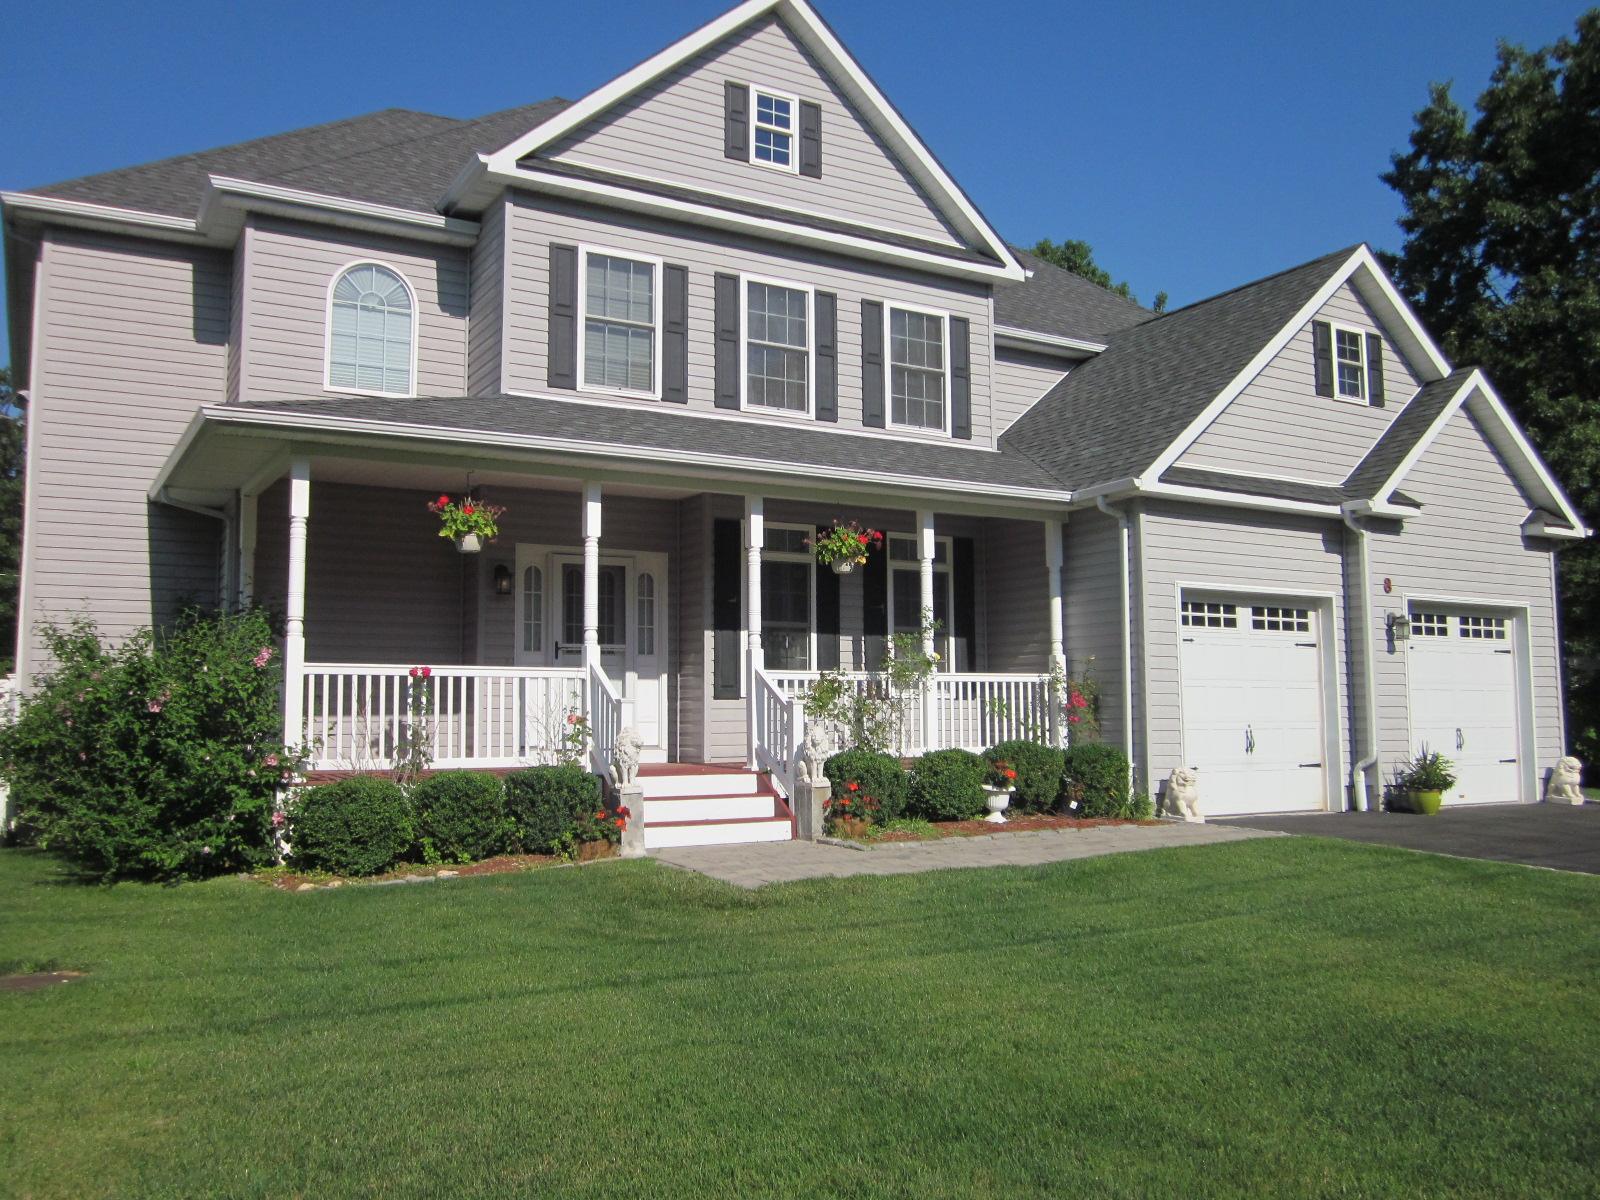 Single Family Home for Sale at Diamond Post Modern 8 James Monroe Ln Setauket, New York, 11733 United States